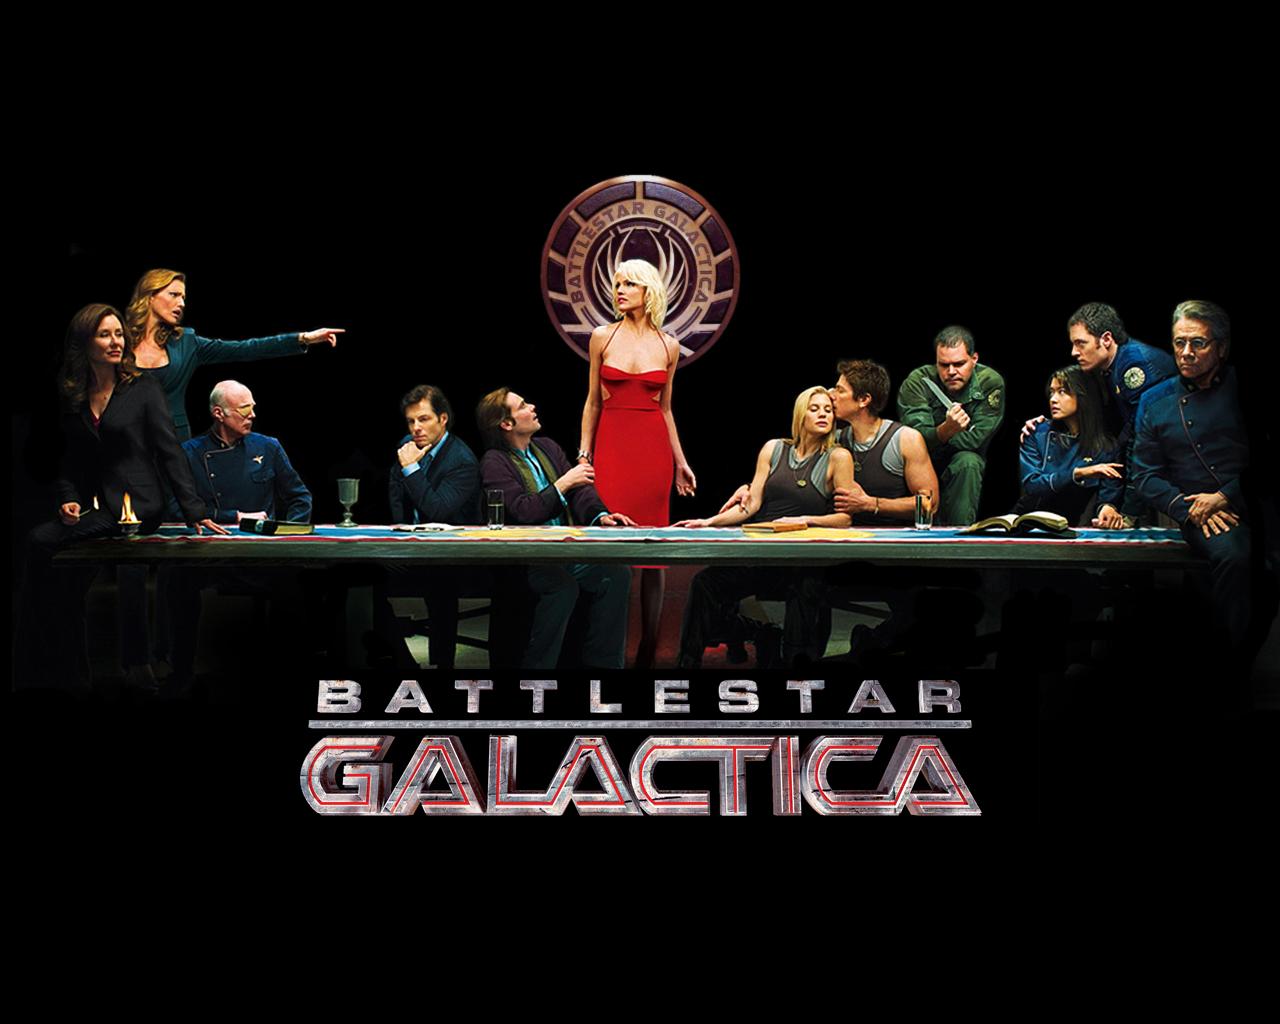 Risultati immagini per battlestar galactica